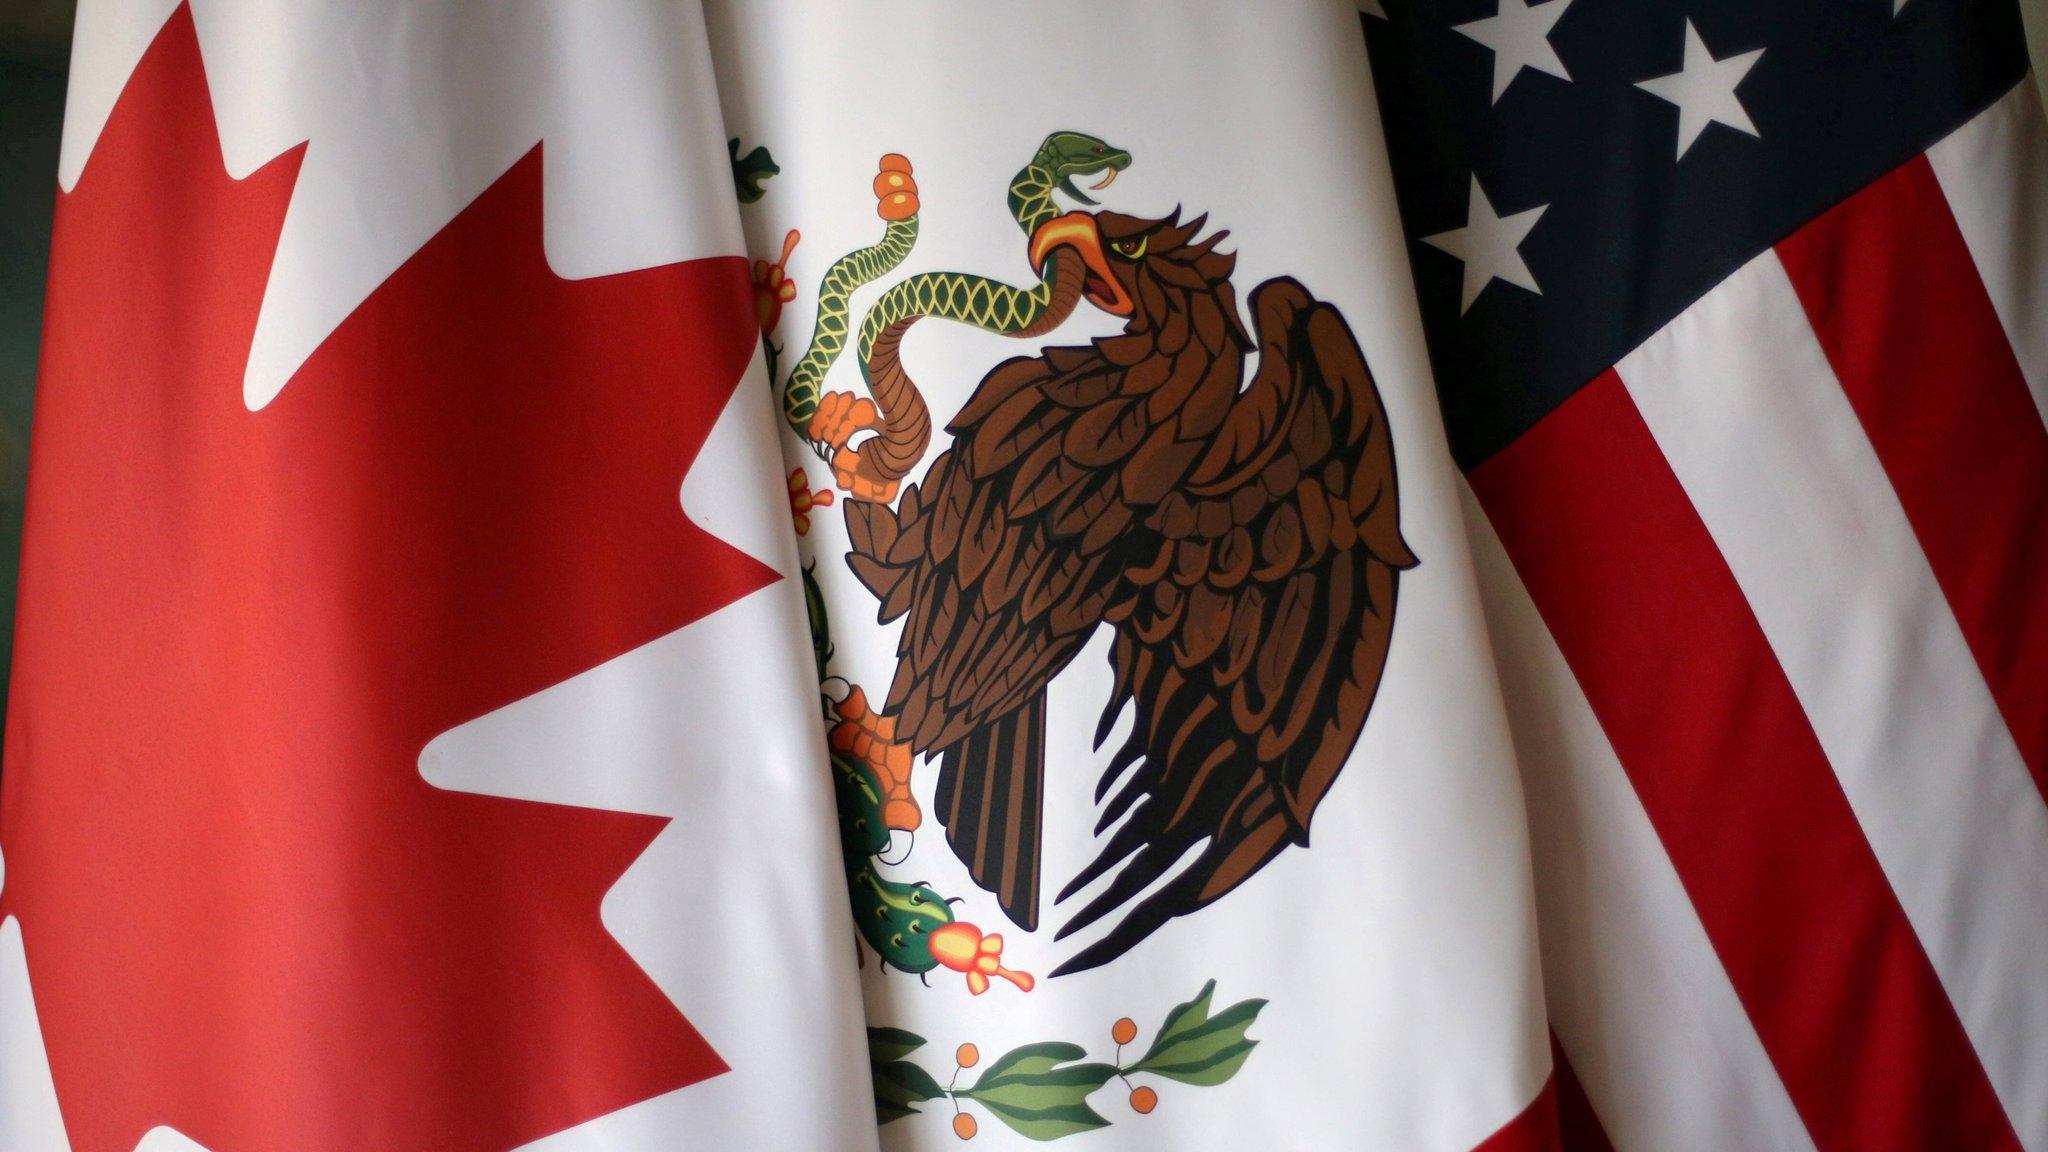 Political concerns push out Nafta talks deadline